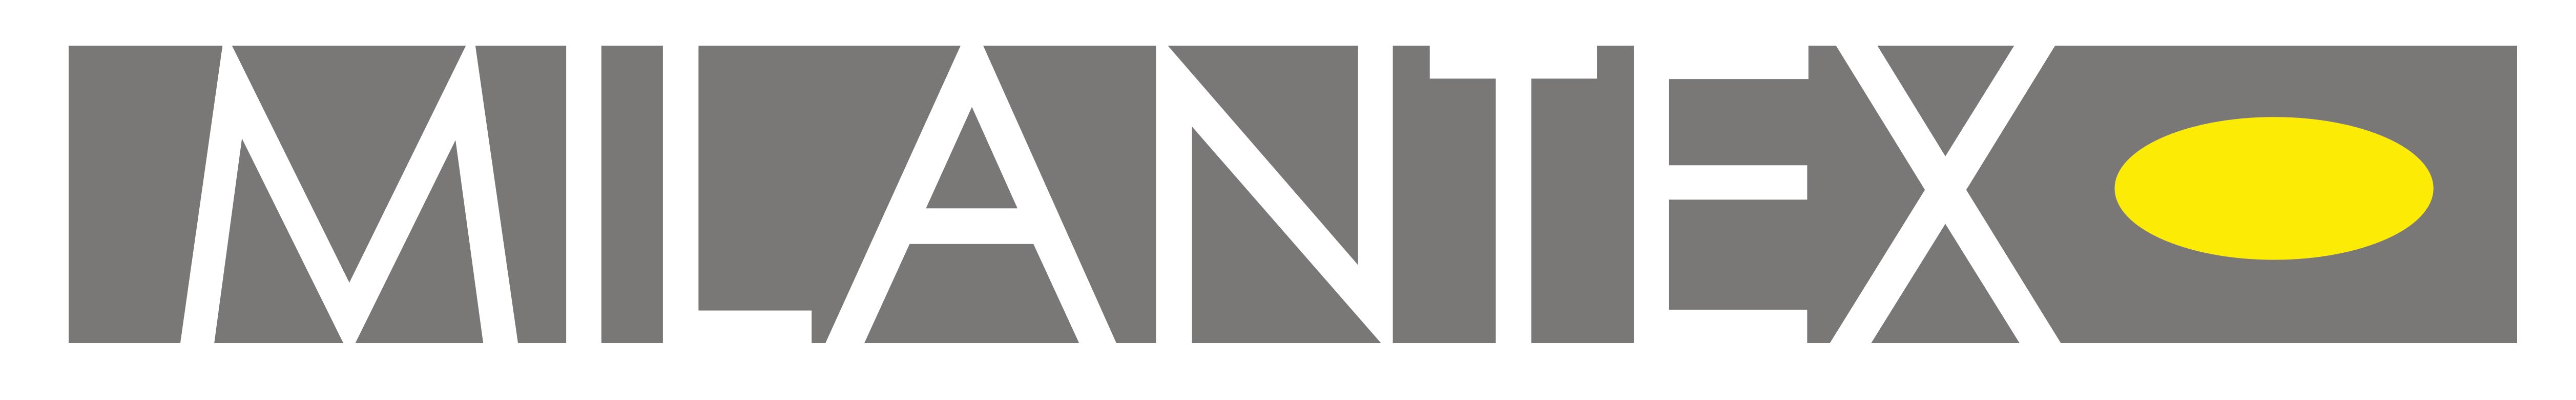 Milantex